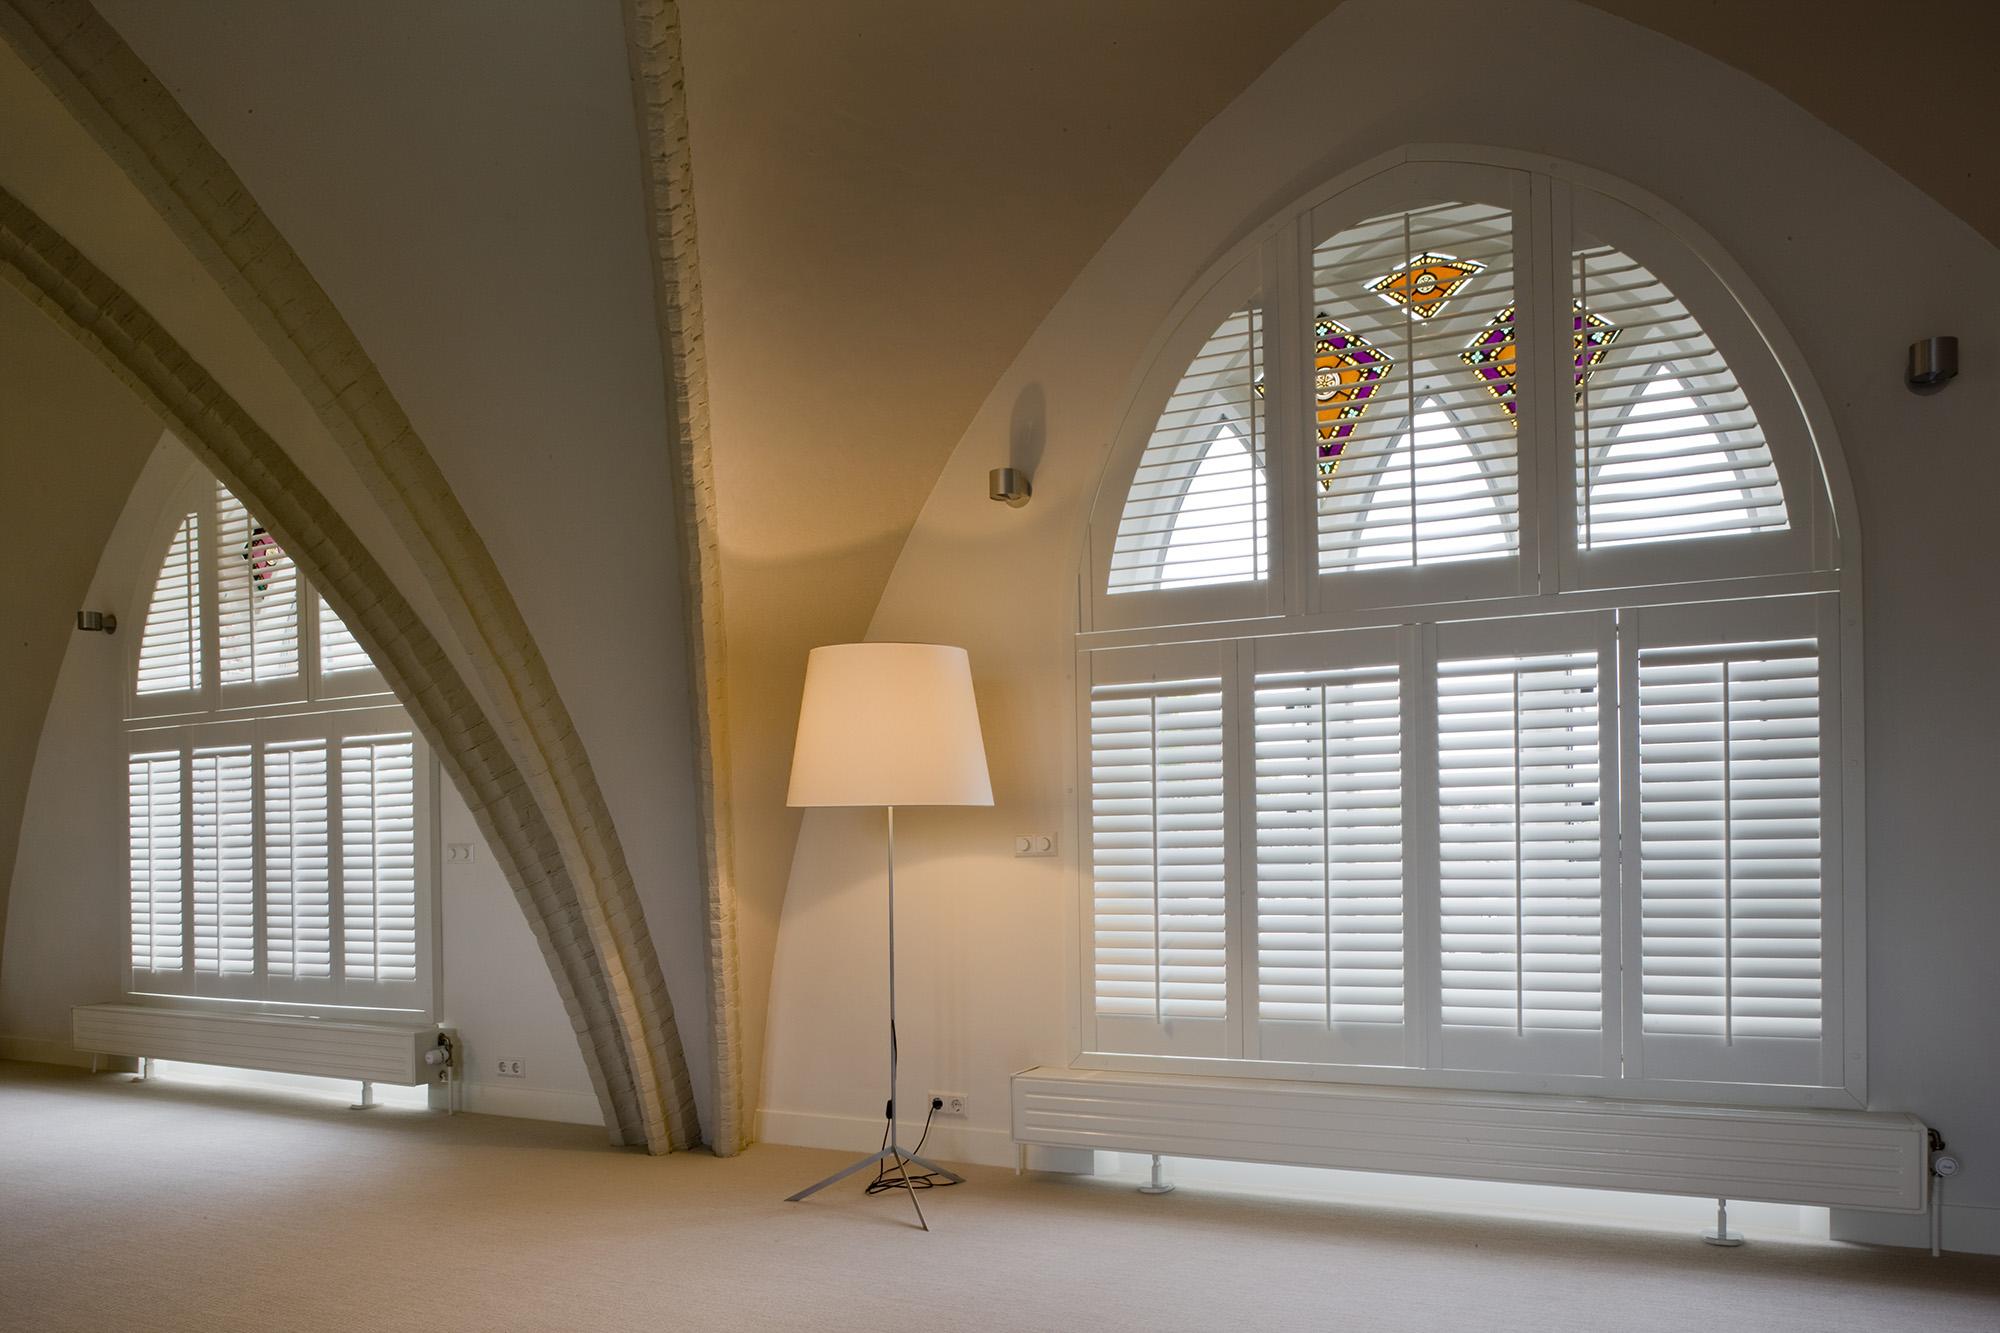 Triangle windows photos supplying wooden window shutters for - Special Shape Window Shutters